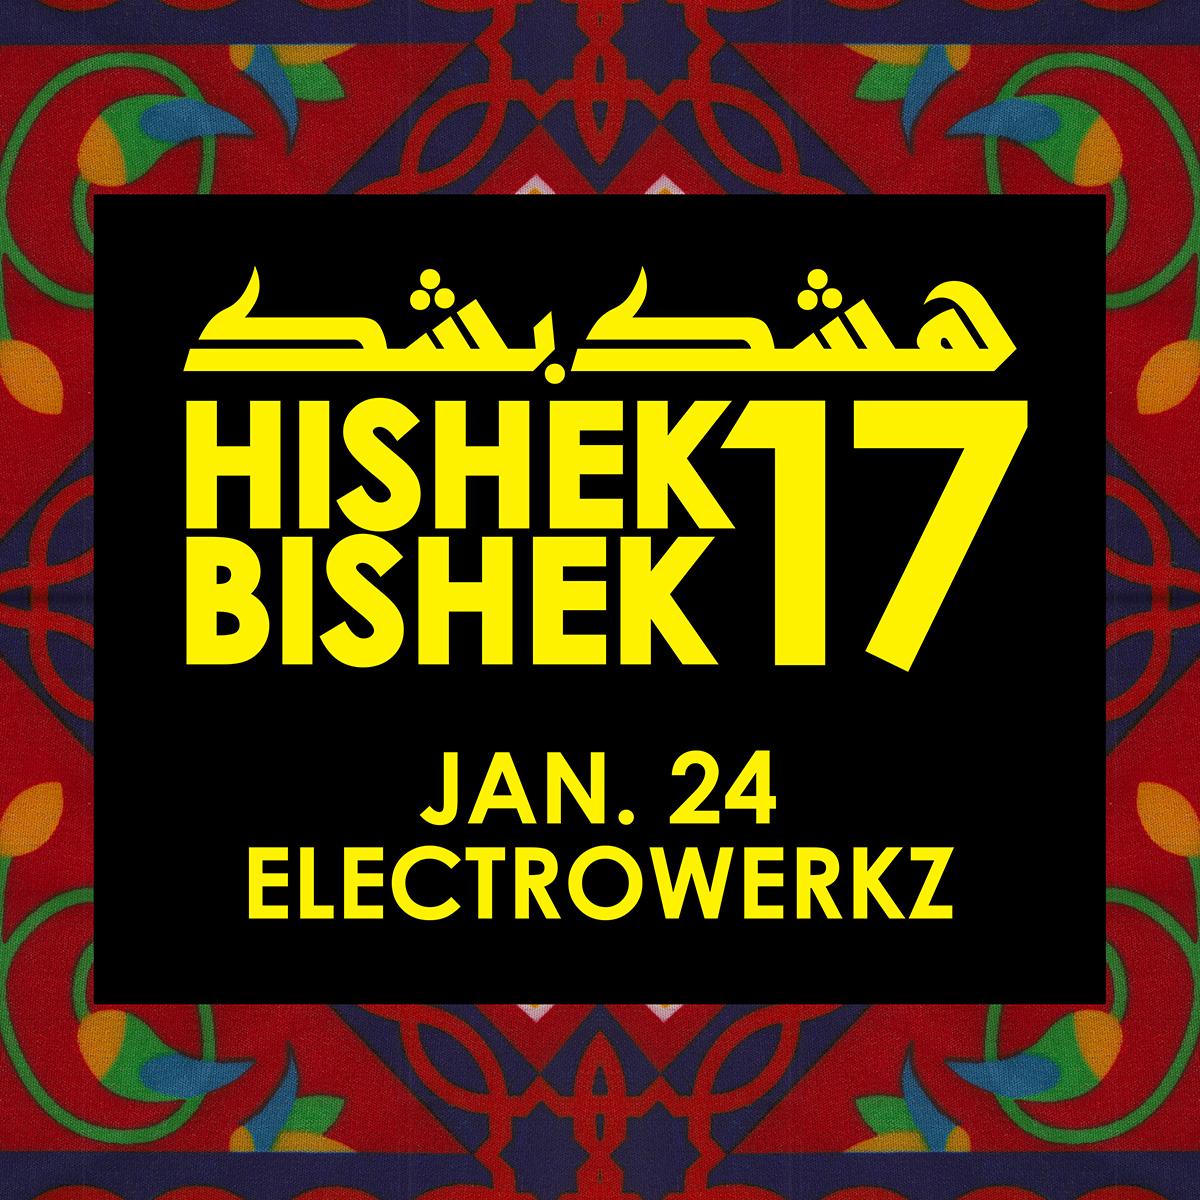 Hishek Bishek 17 IG